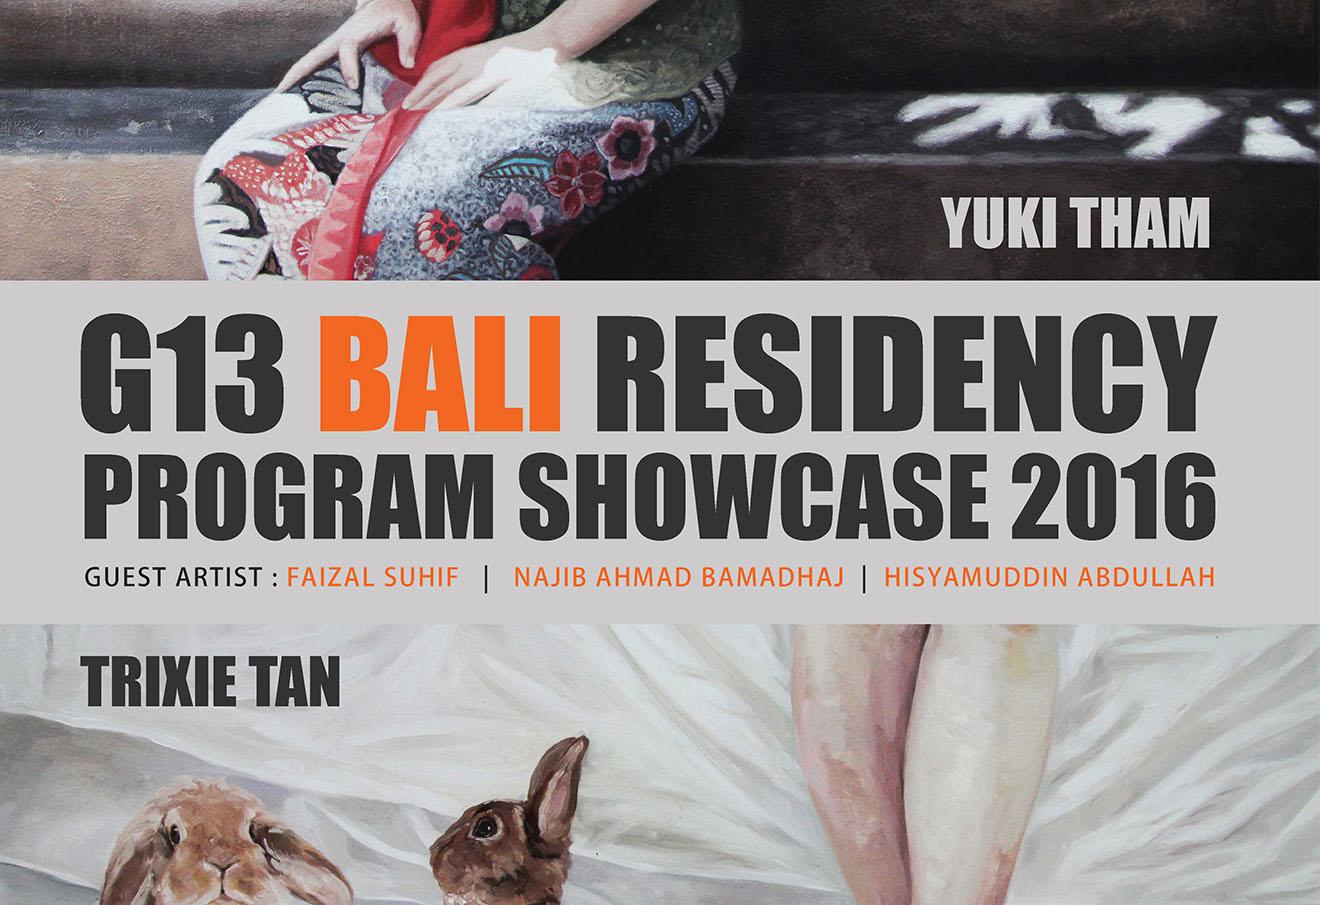 G13 Bali Residency